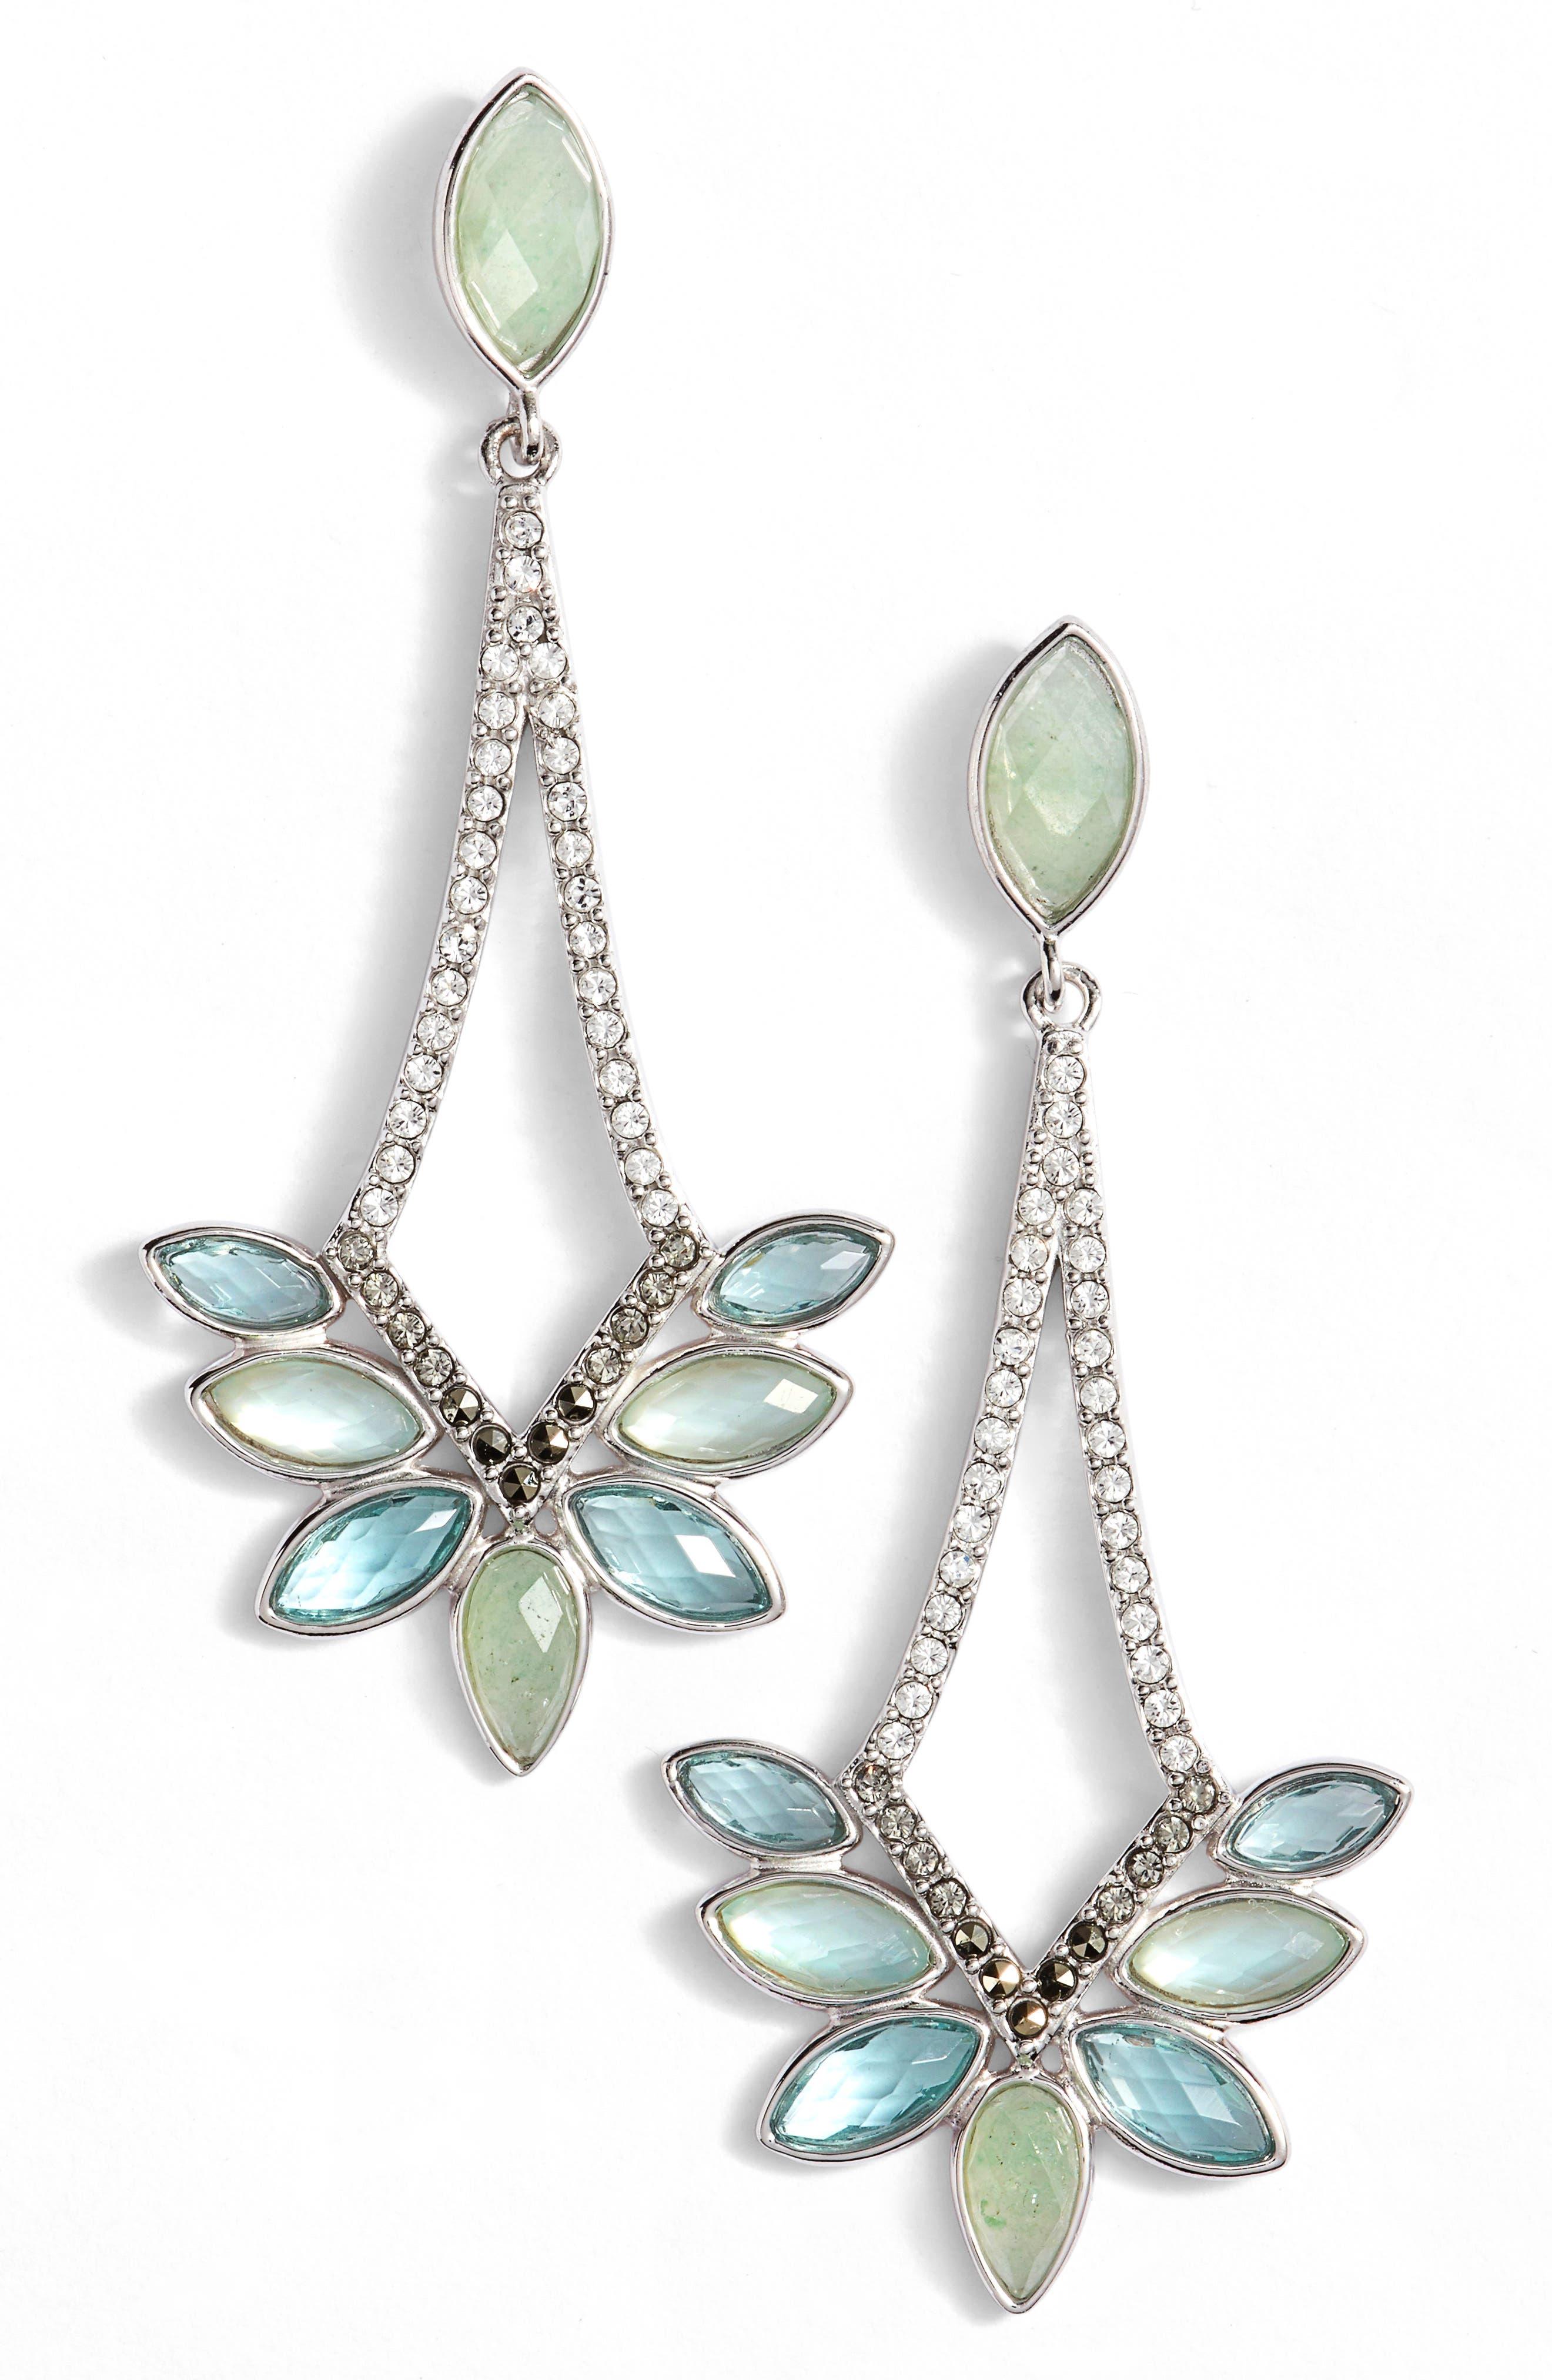 Judith Jack Lakeside Drop Earrings